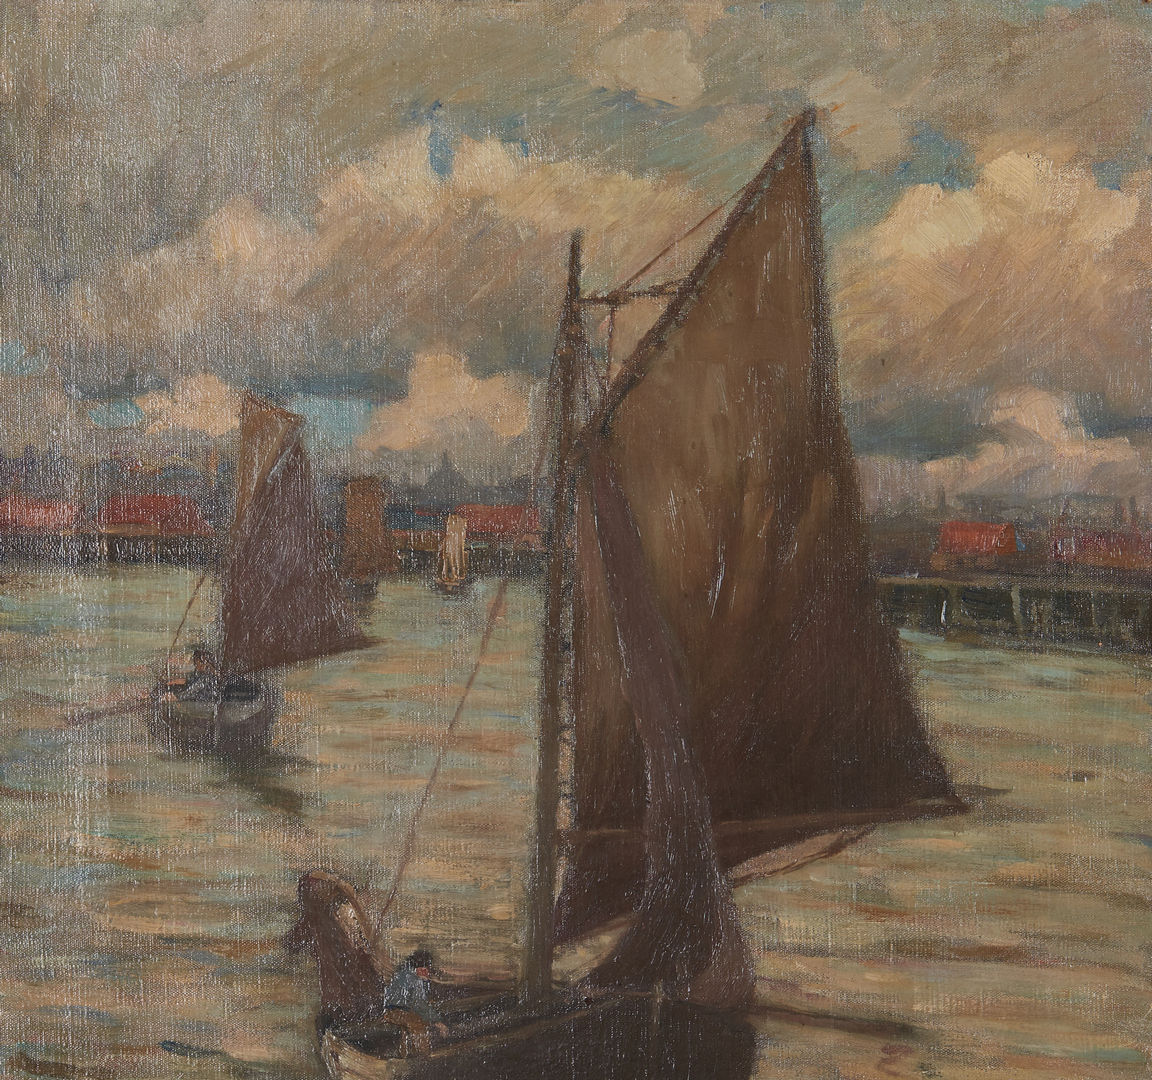 Lot 1053: European School O/C Maritime Painting